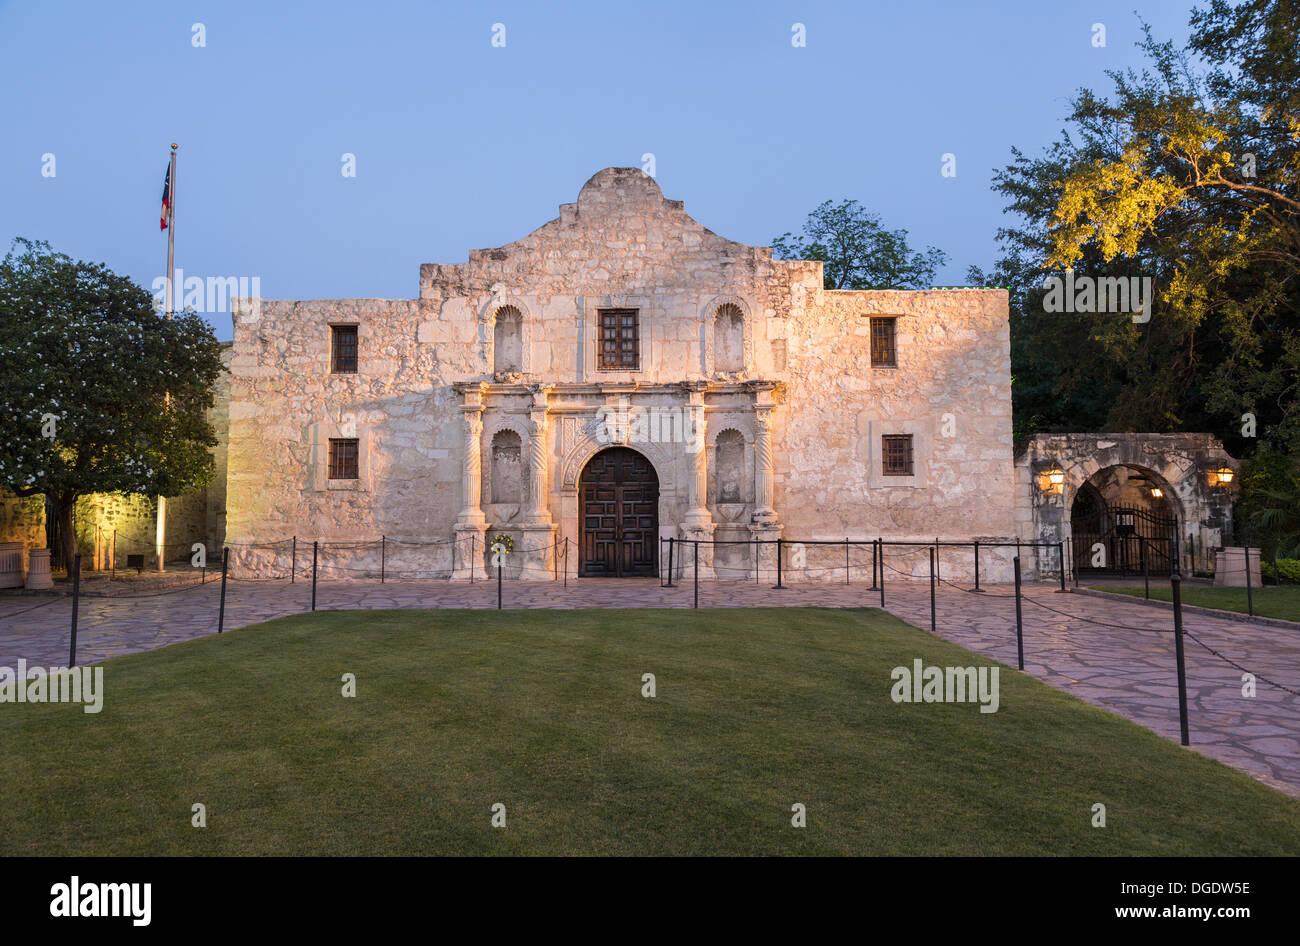 The Alamo at dusk San Antonio Texas USA - Stock Image